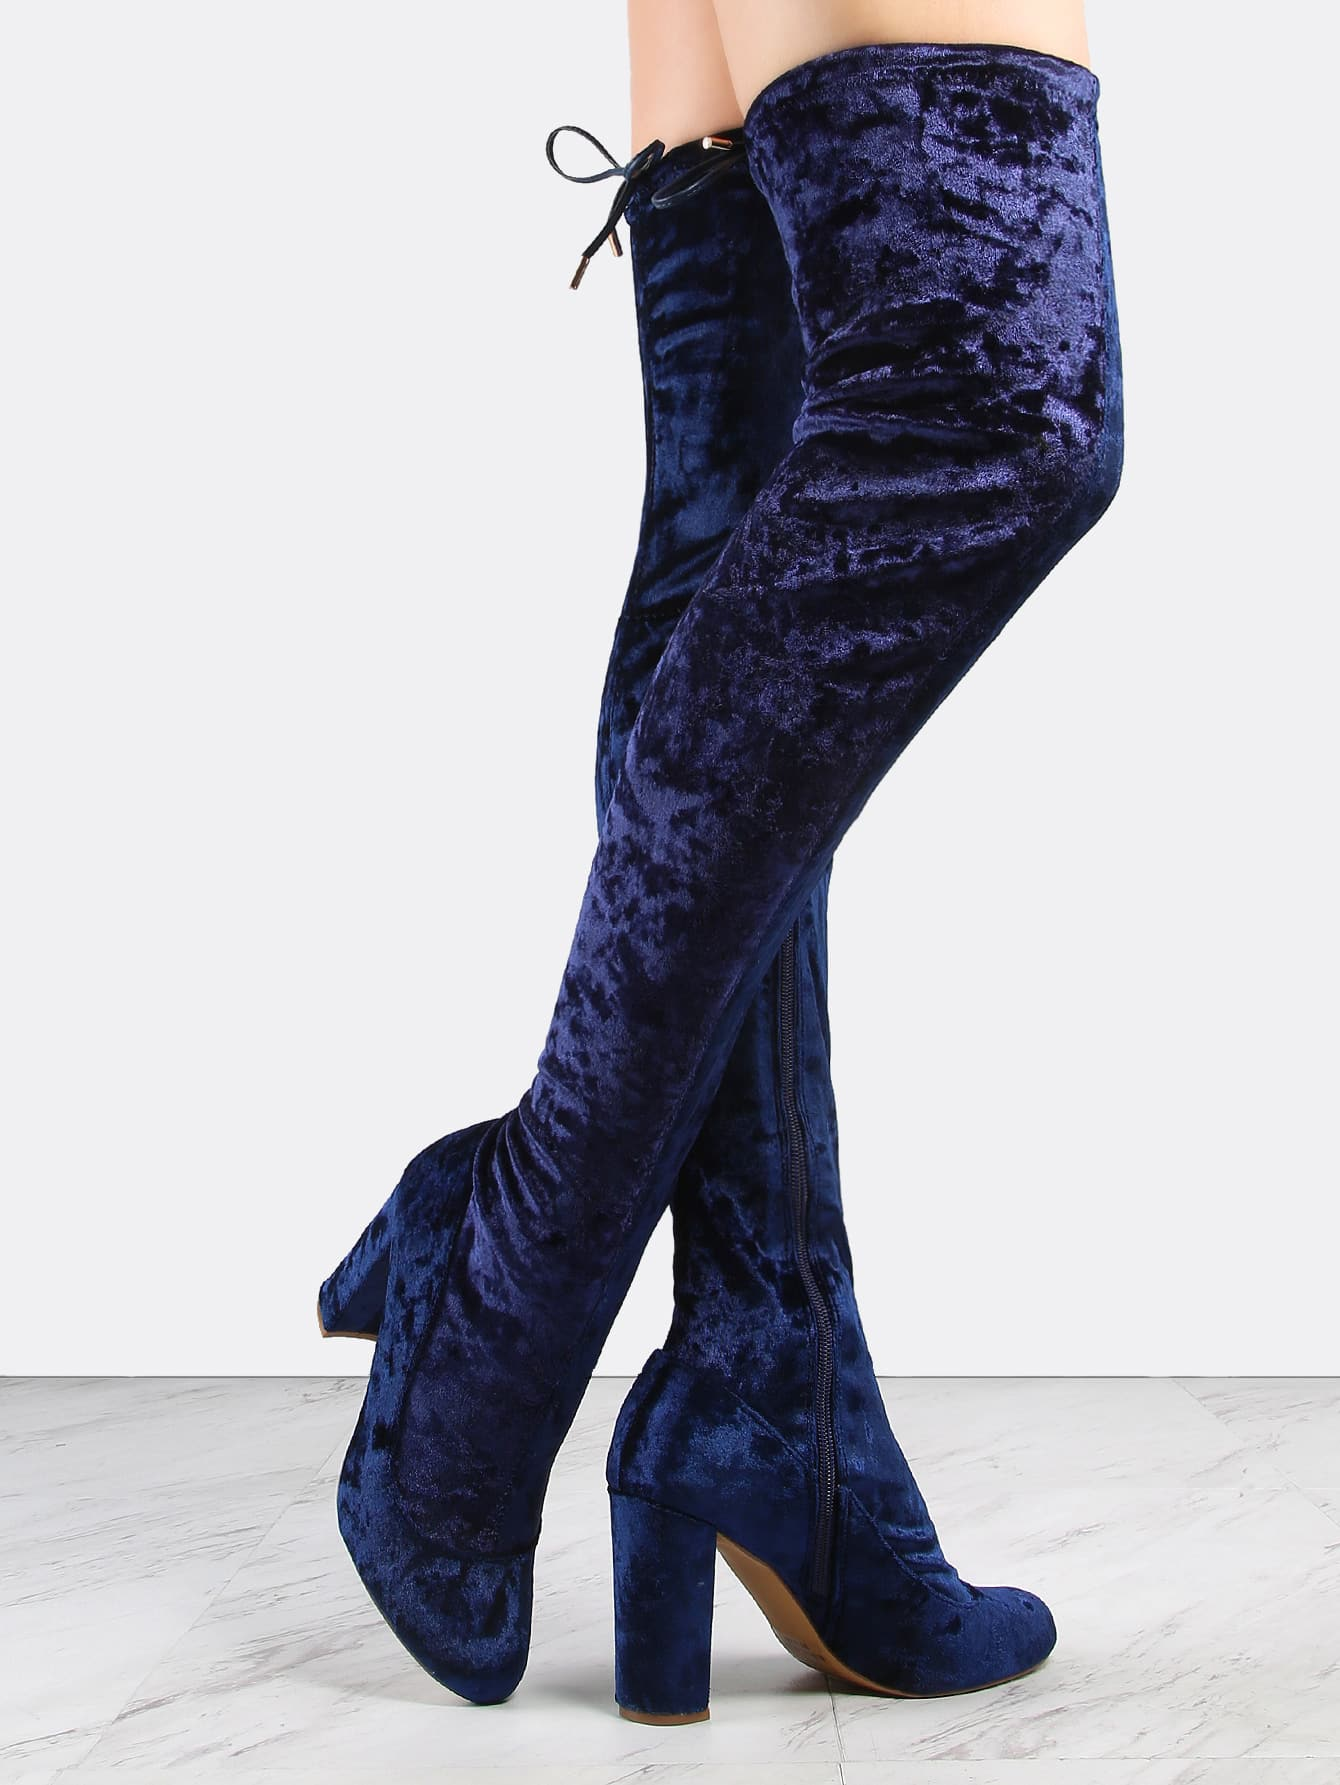 Crushed Velvet Thigh High Boots NAVY -SheIn(Sheinside)